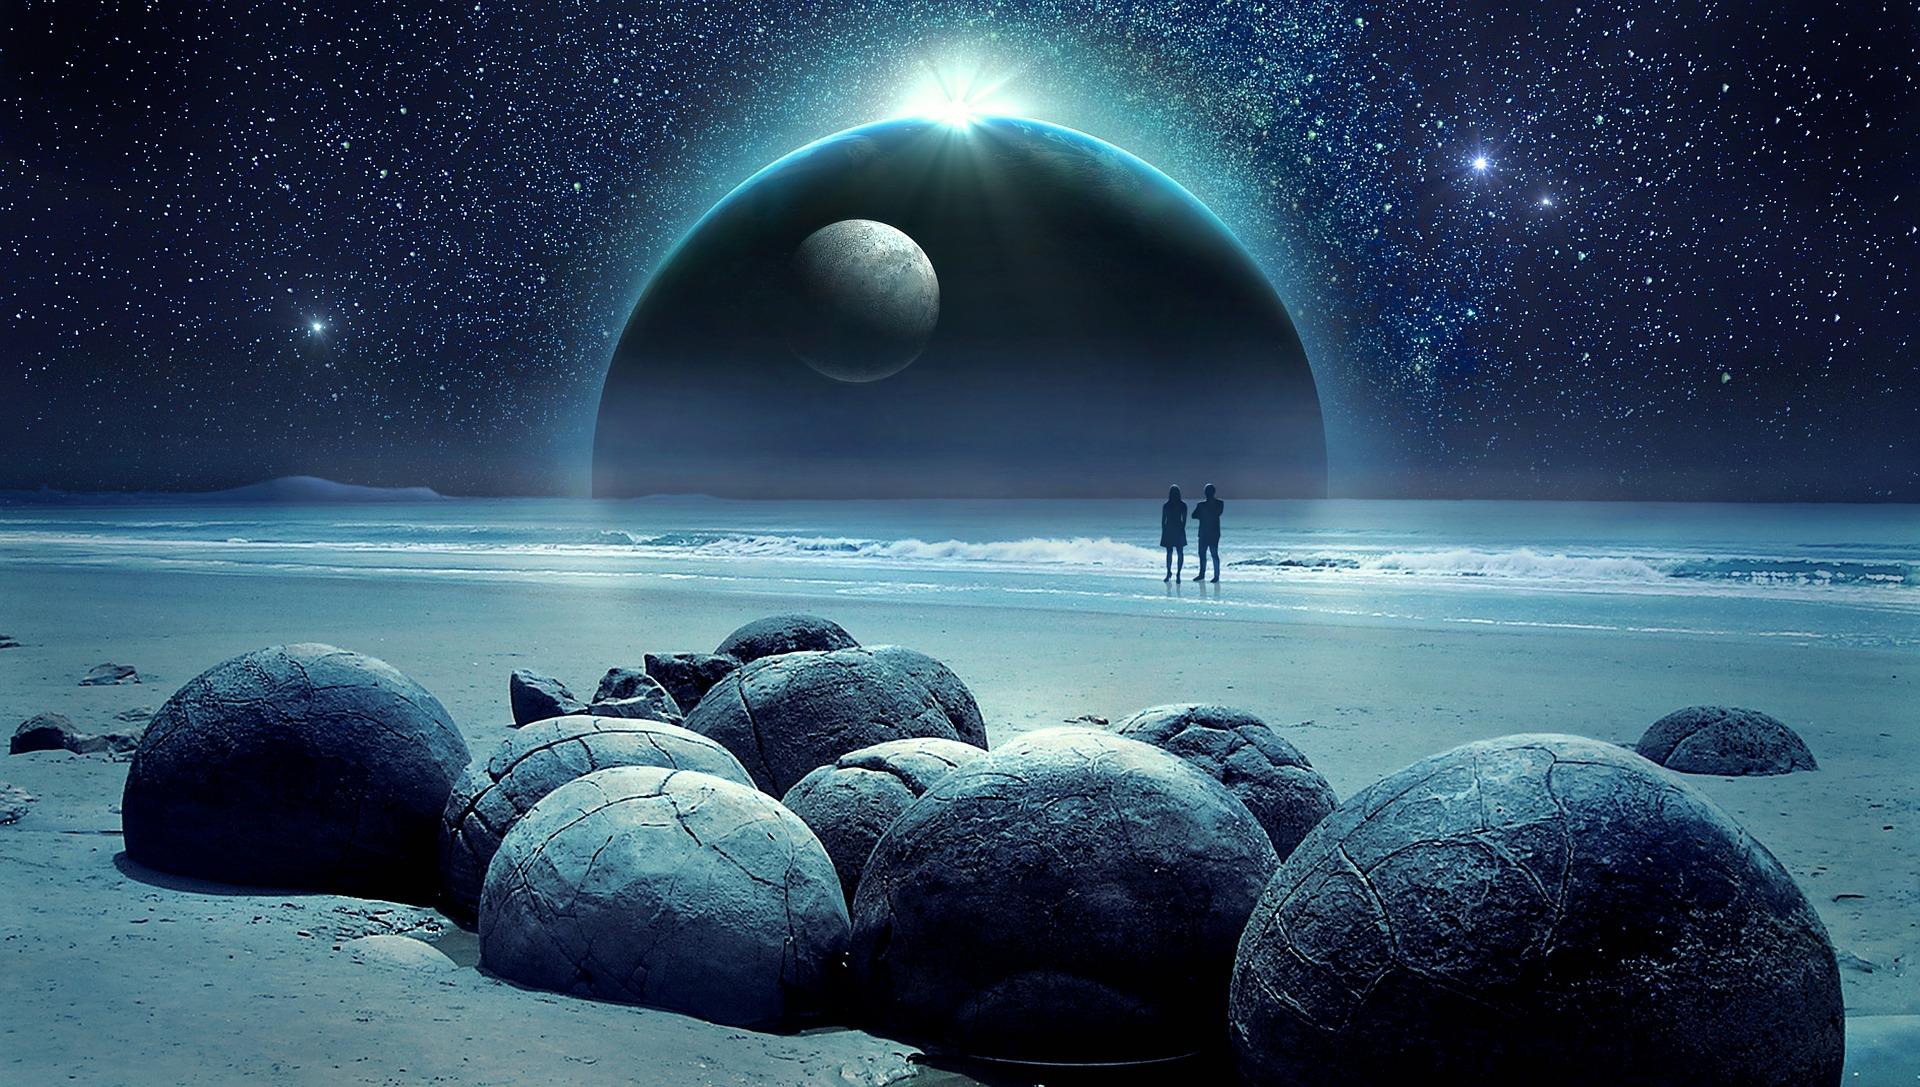 FORUM YOGA & Coaching - Warum Astrologie?